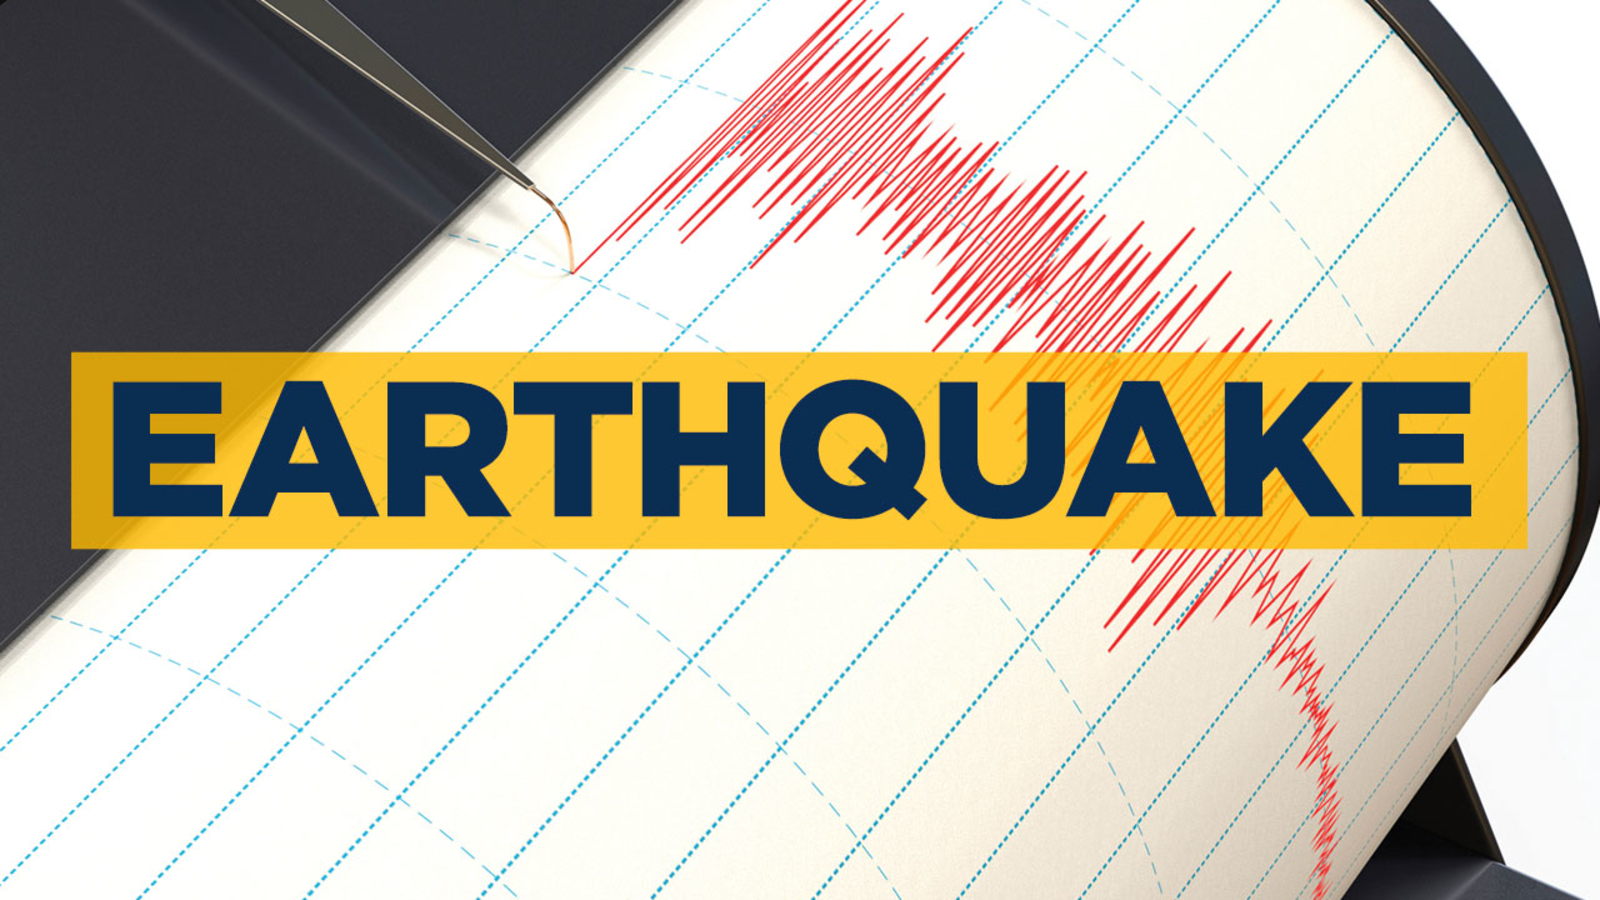 4.6 magnitude earthquake hits San Gabriel Valley, shaking felt in I.E.